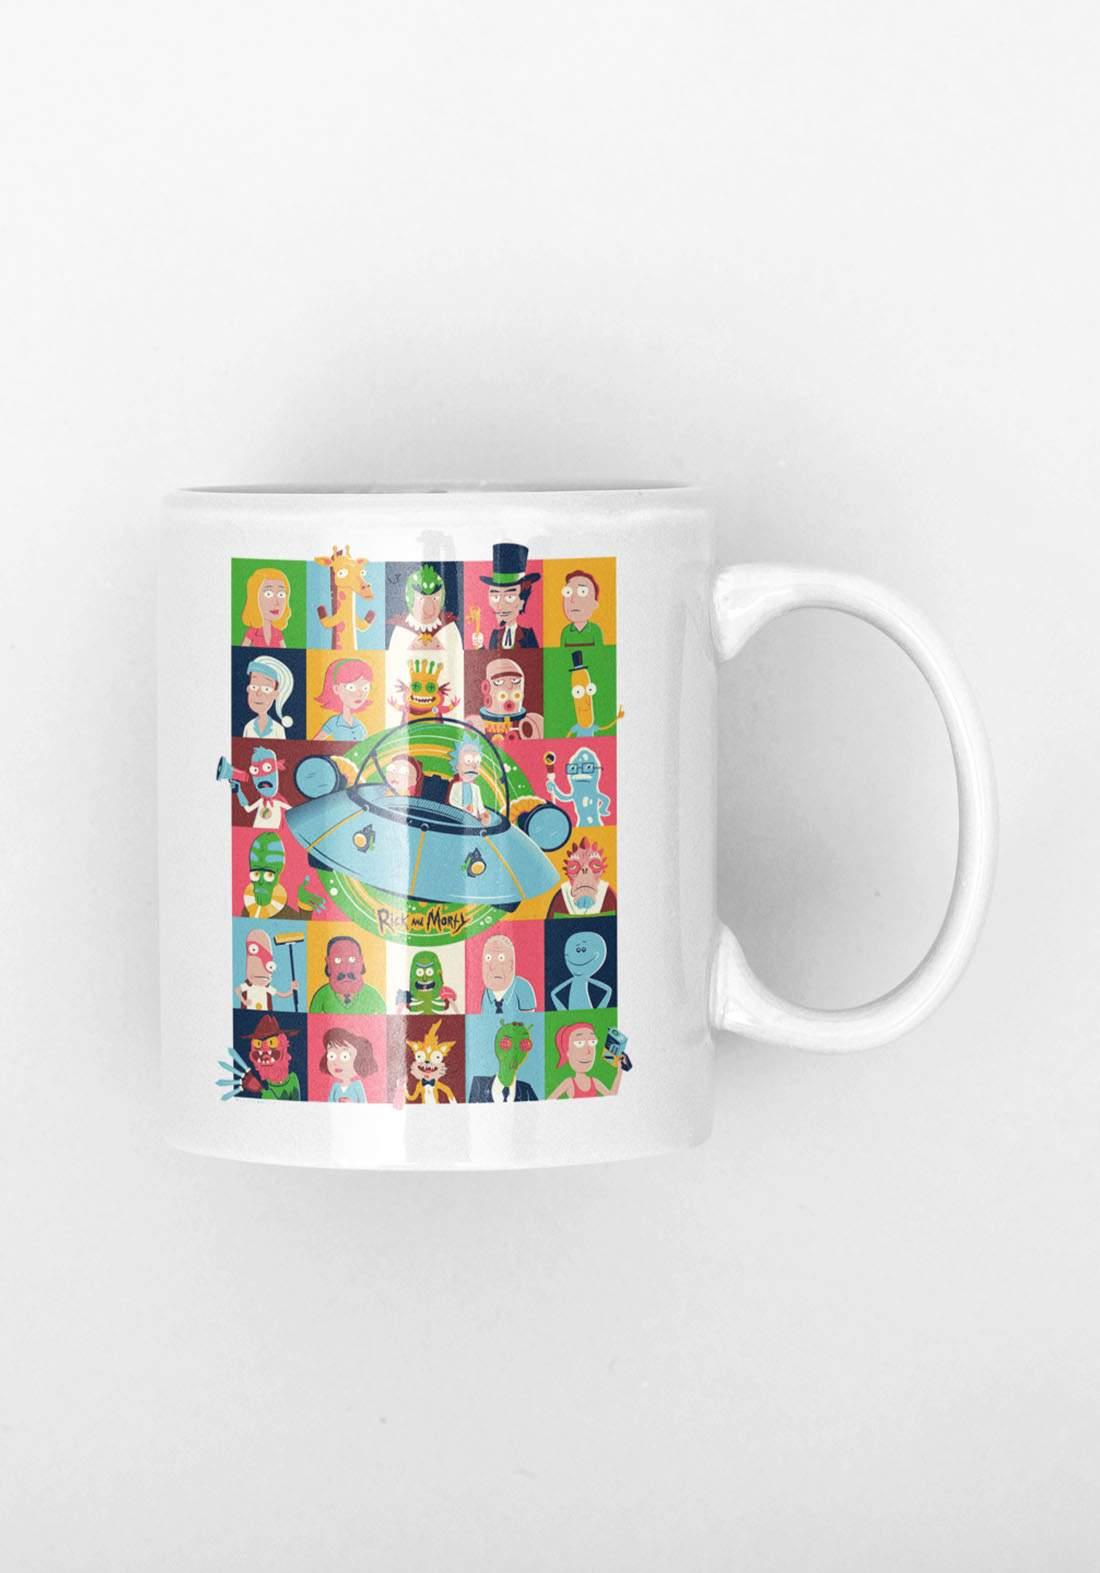 Rick & Morty Mug - كوب ريك اند مورتي